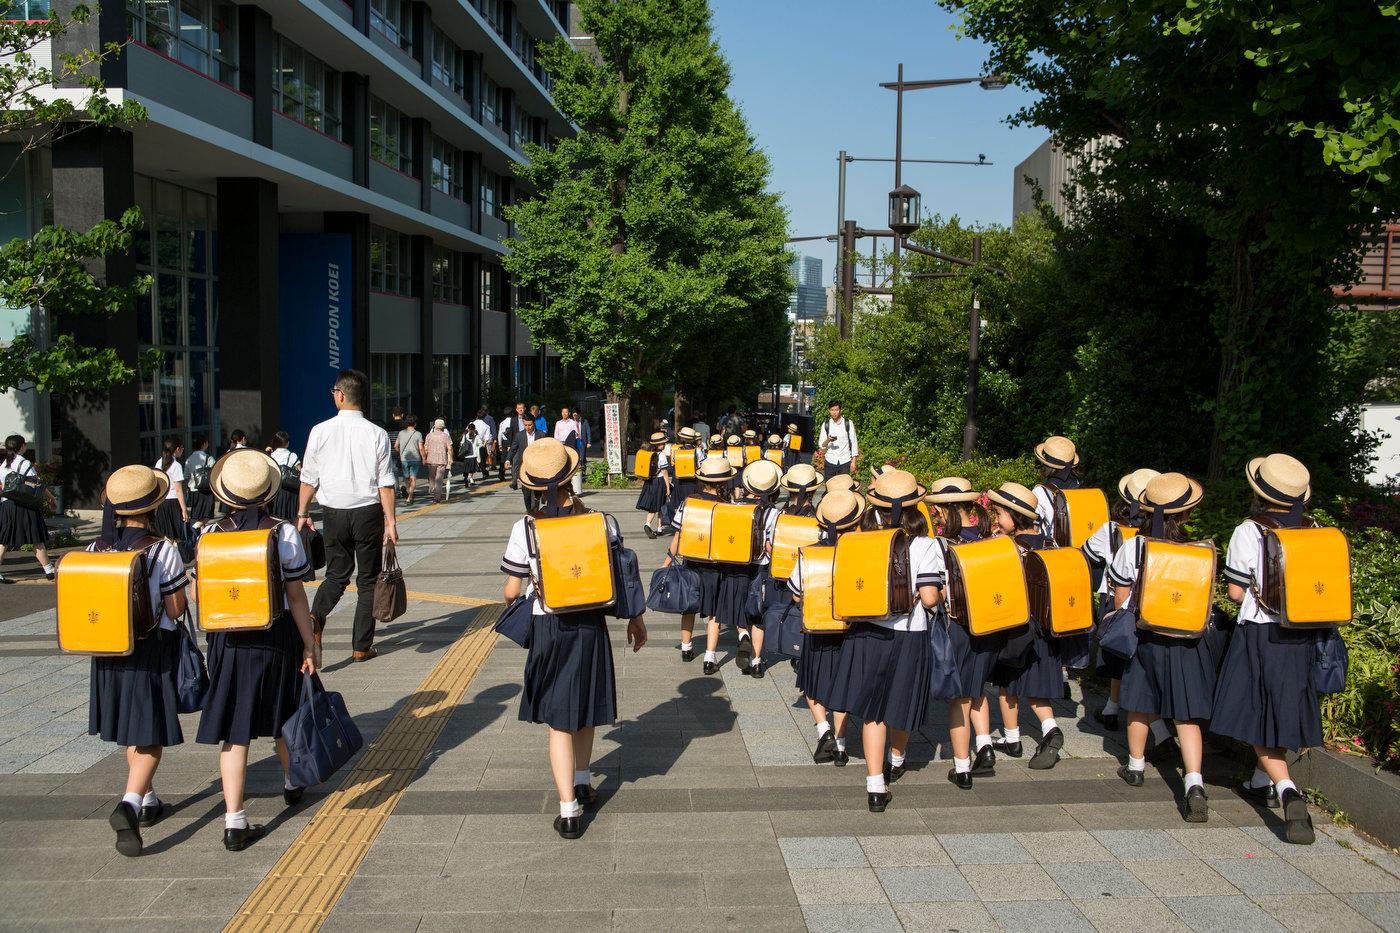 School girls on a field trip, Central Tokyo.